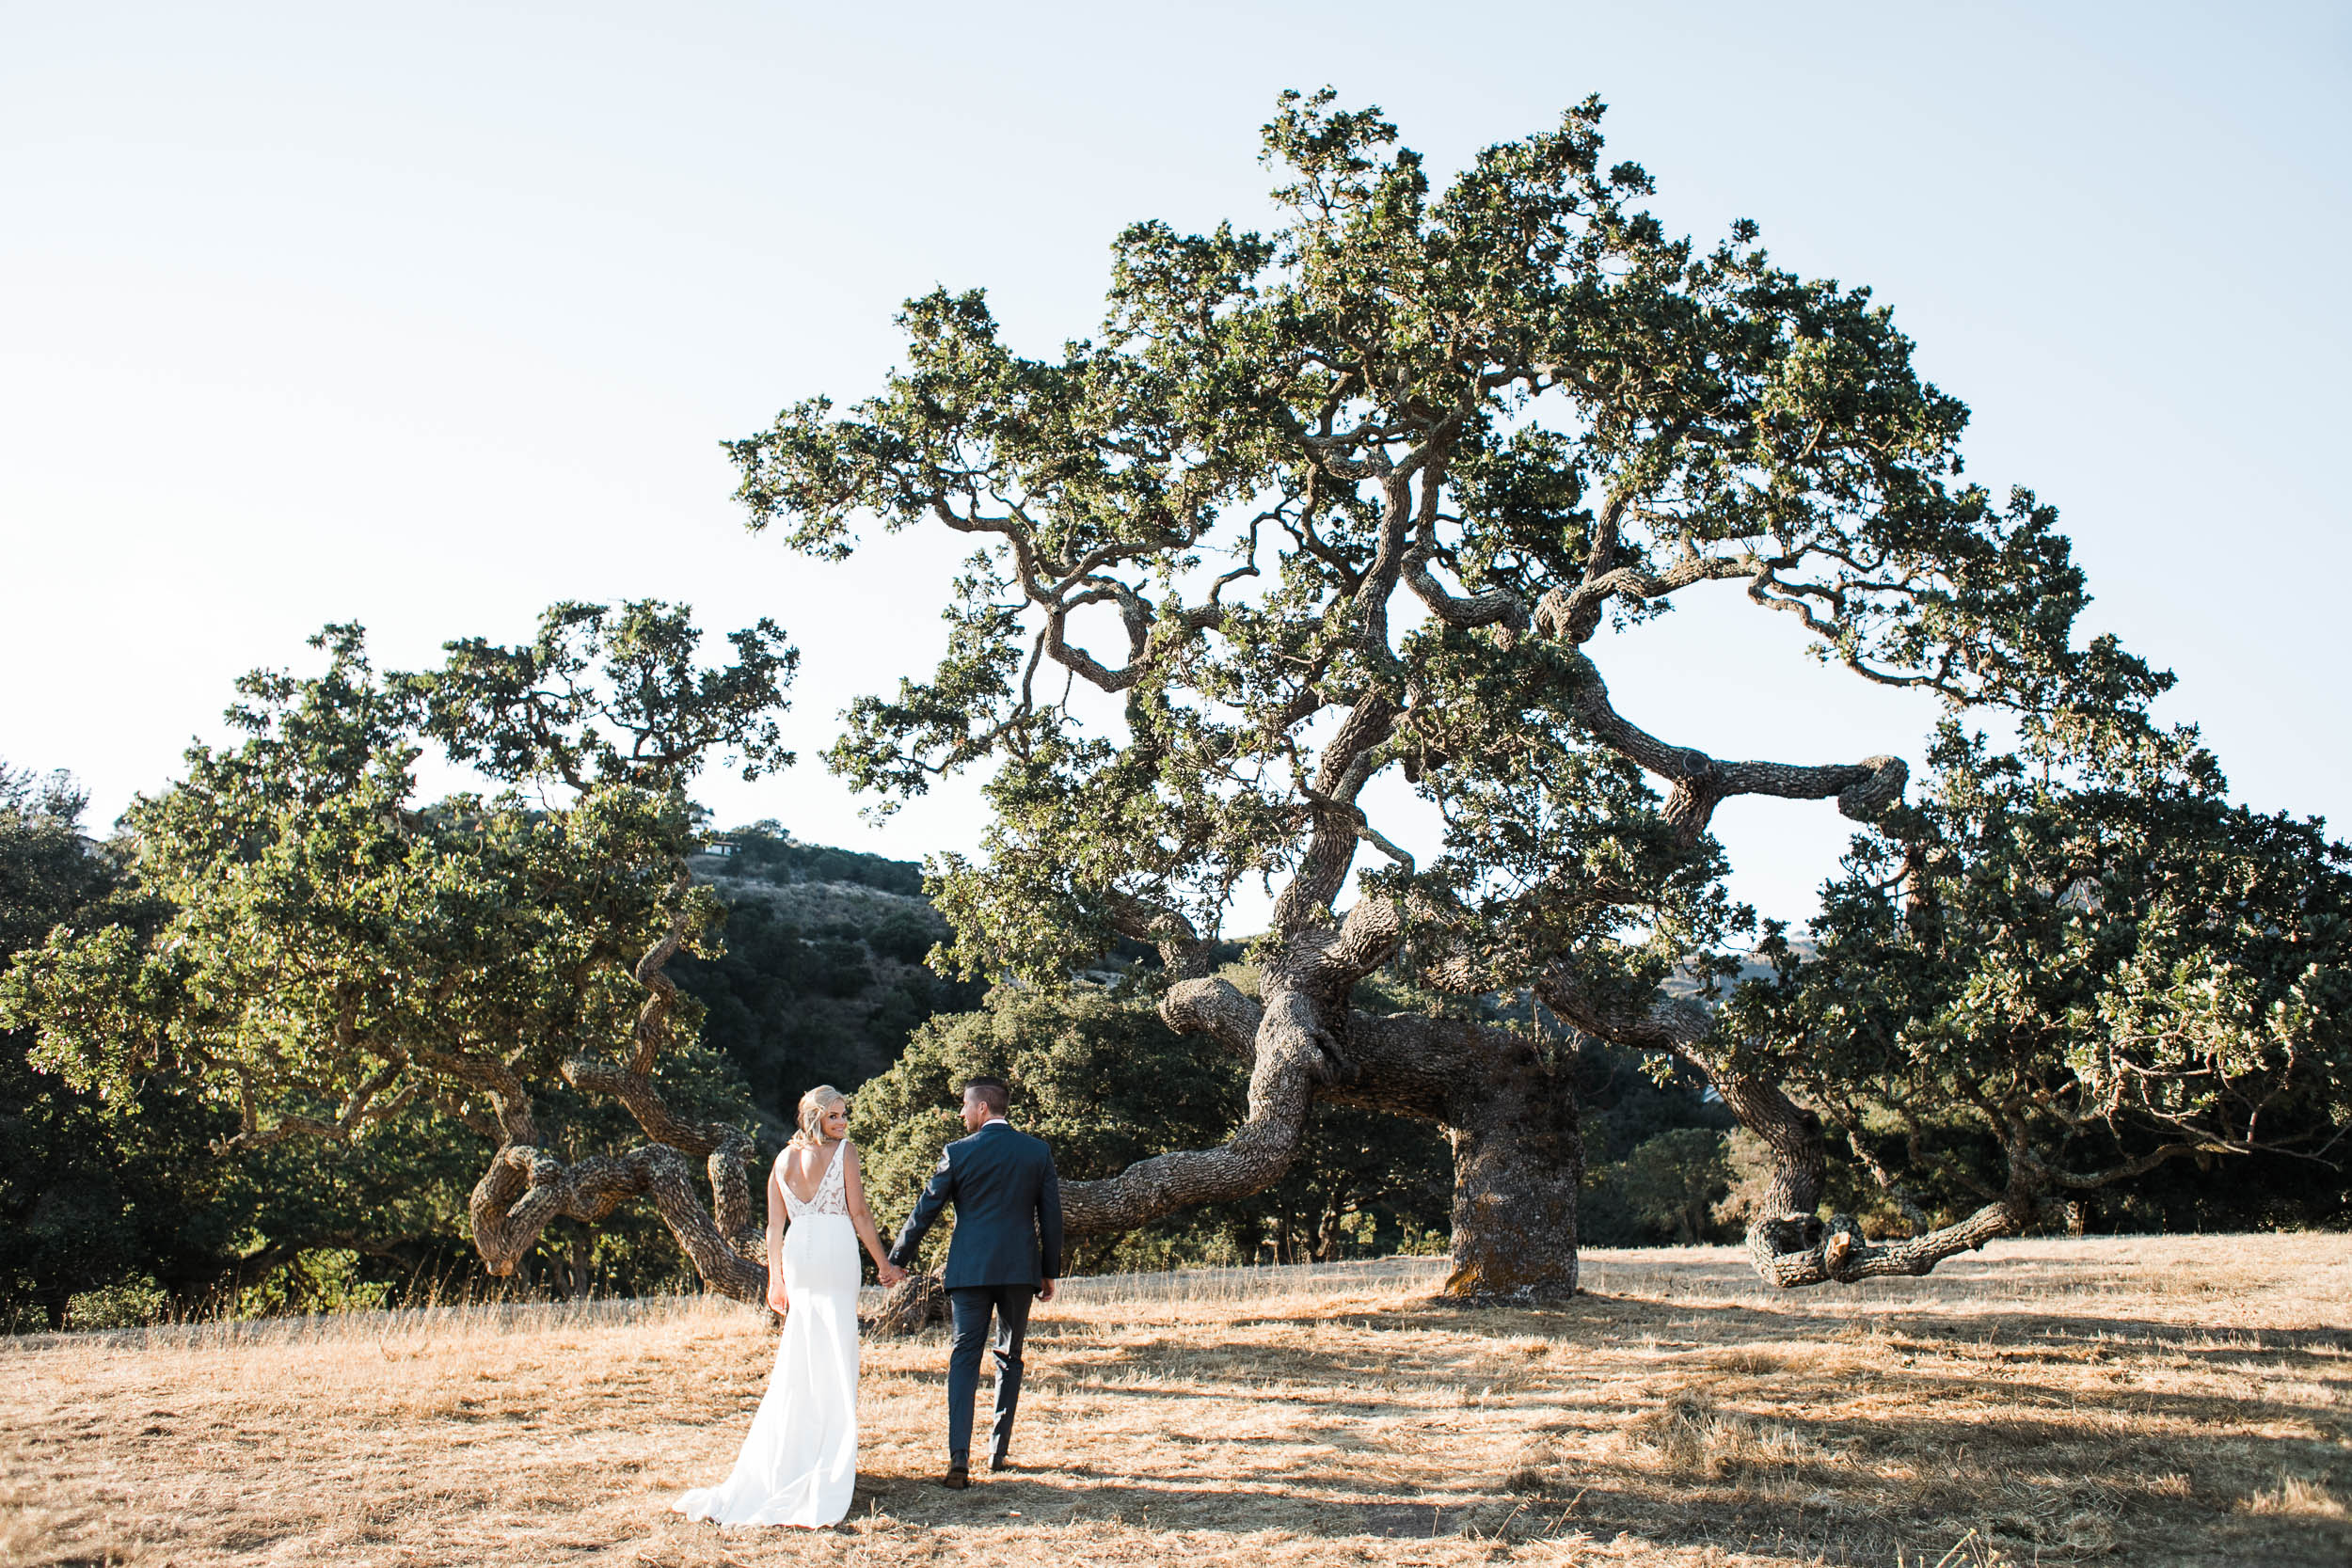 072118_D+K_Holman Ranch Wedding_Buena Lane Photography_1271ER.jpg